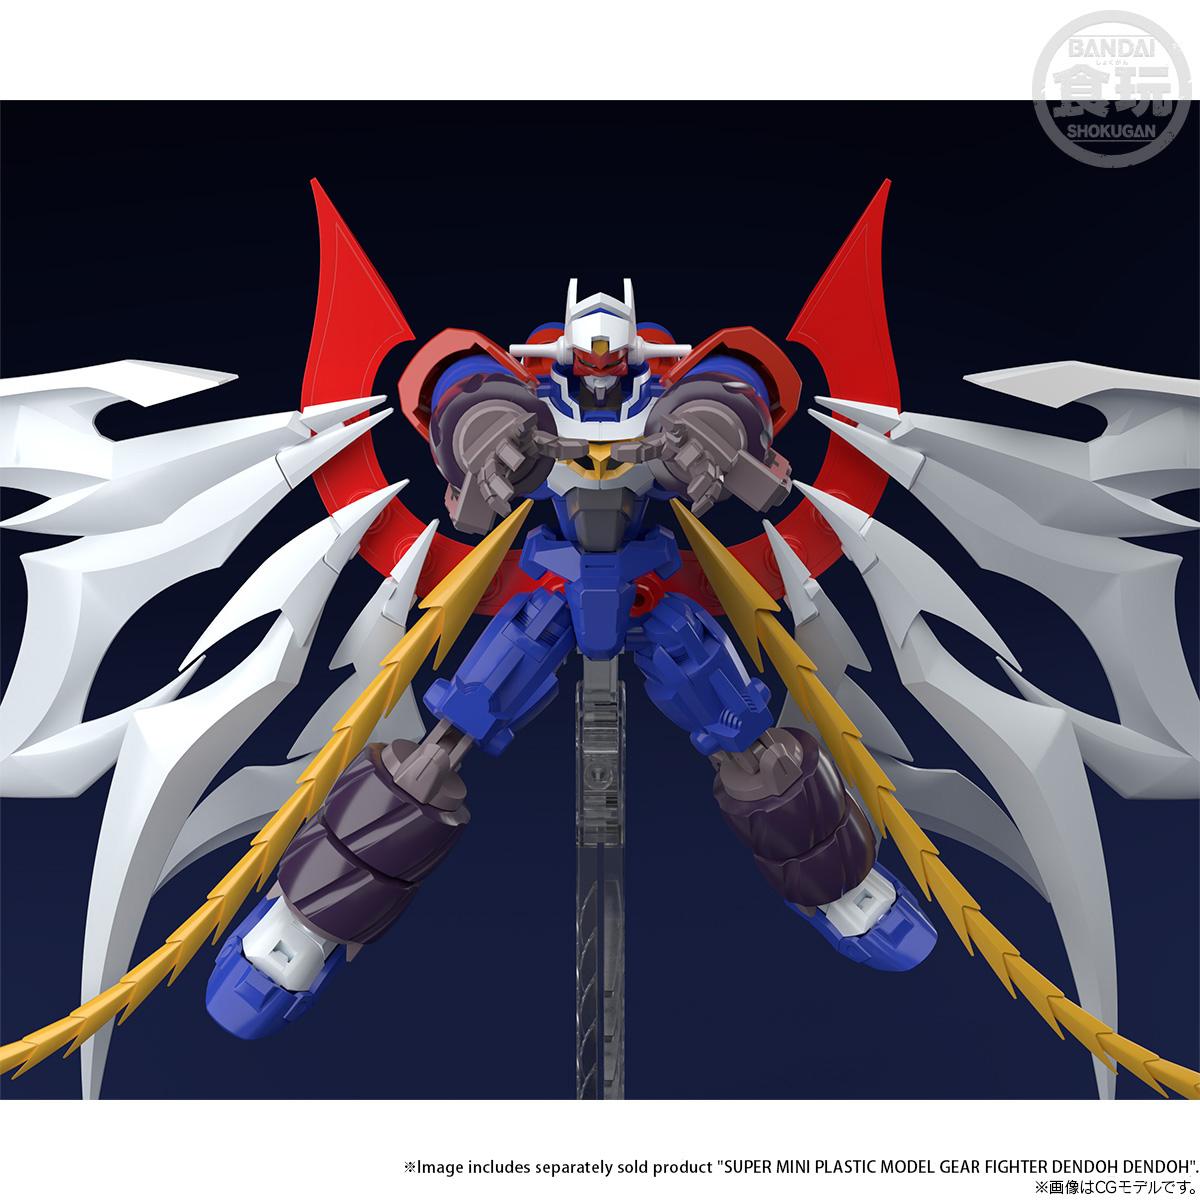 SUPER MINIPLA GEAR FIGHTER DENDOH PHOENIX ALAE & SWORD OF AKATSUKI W/O GUM